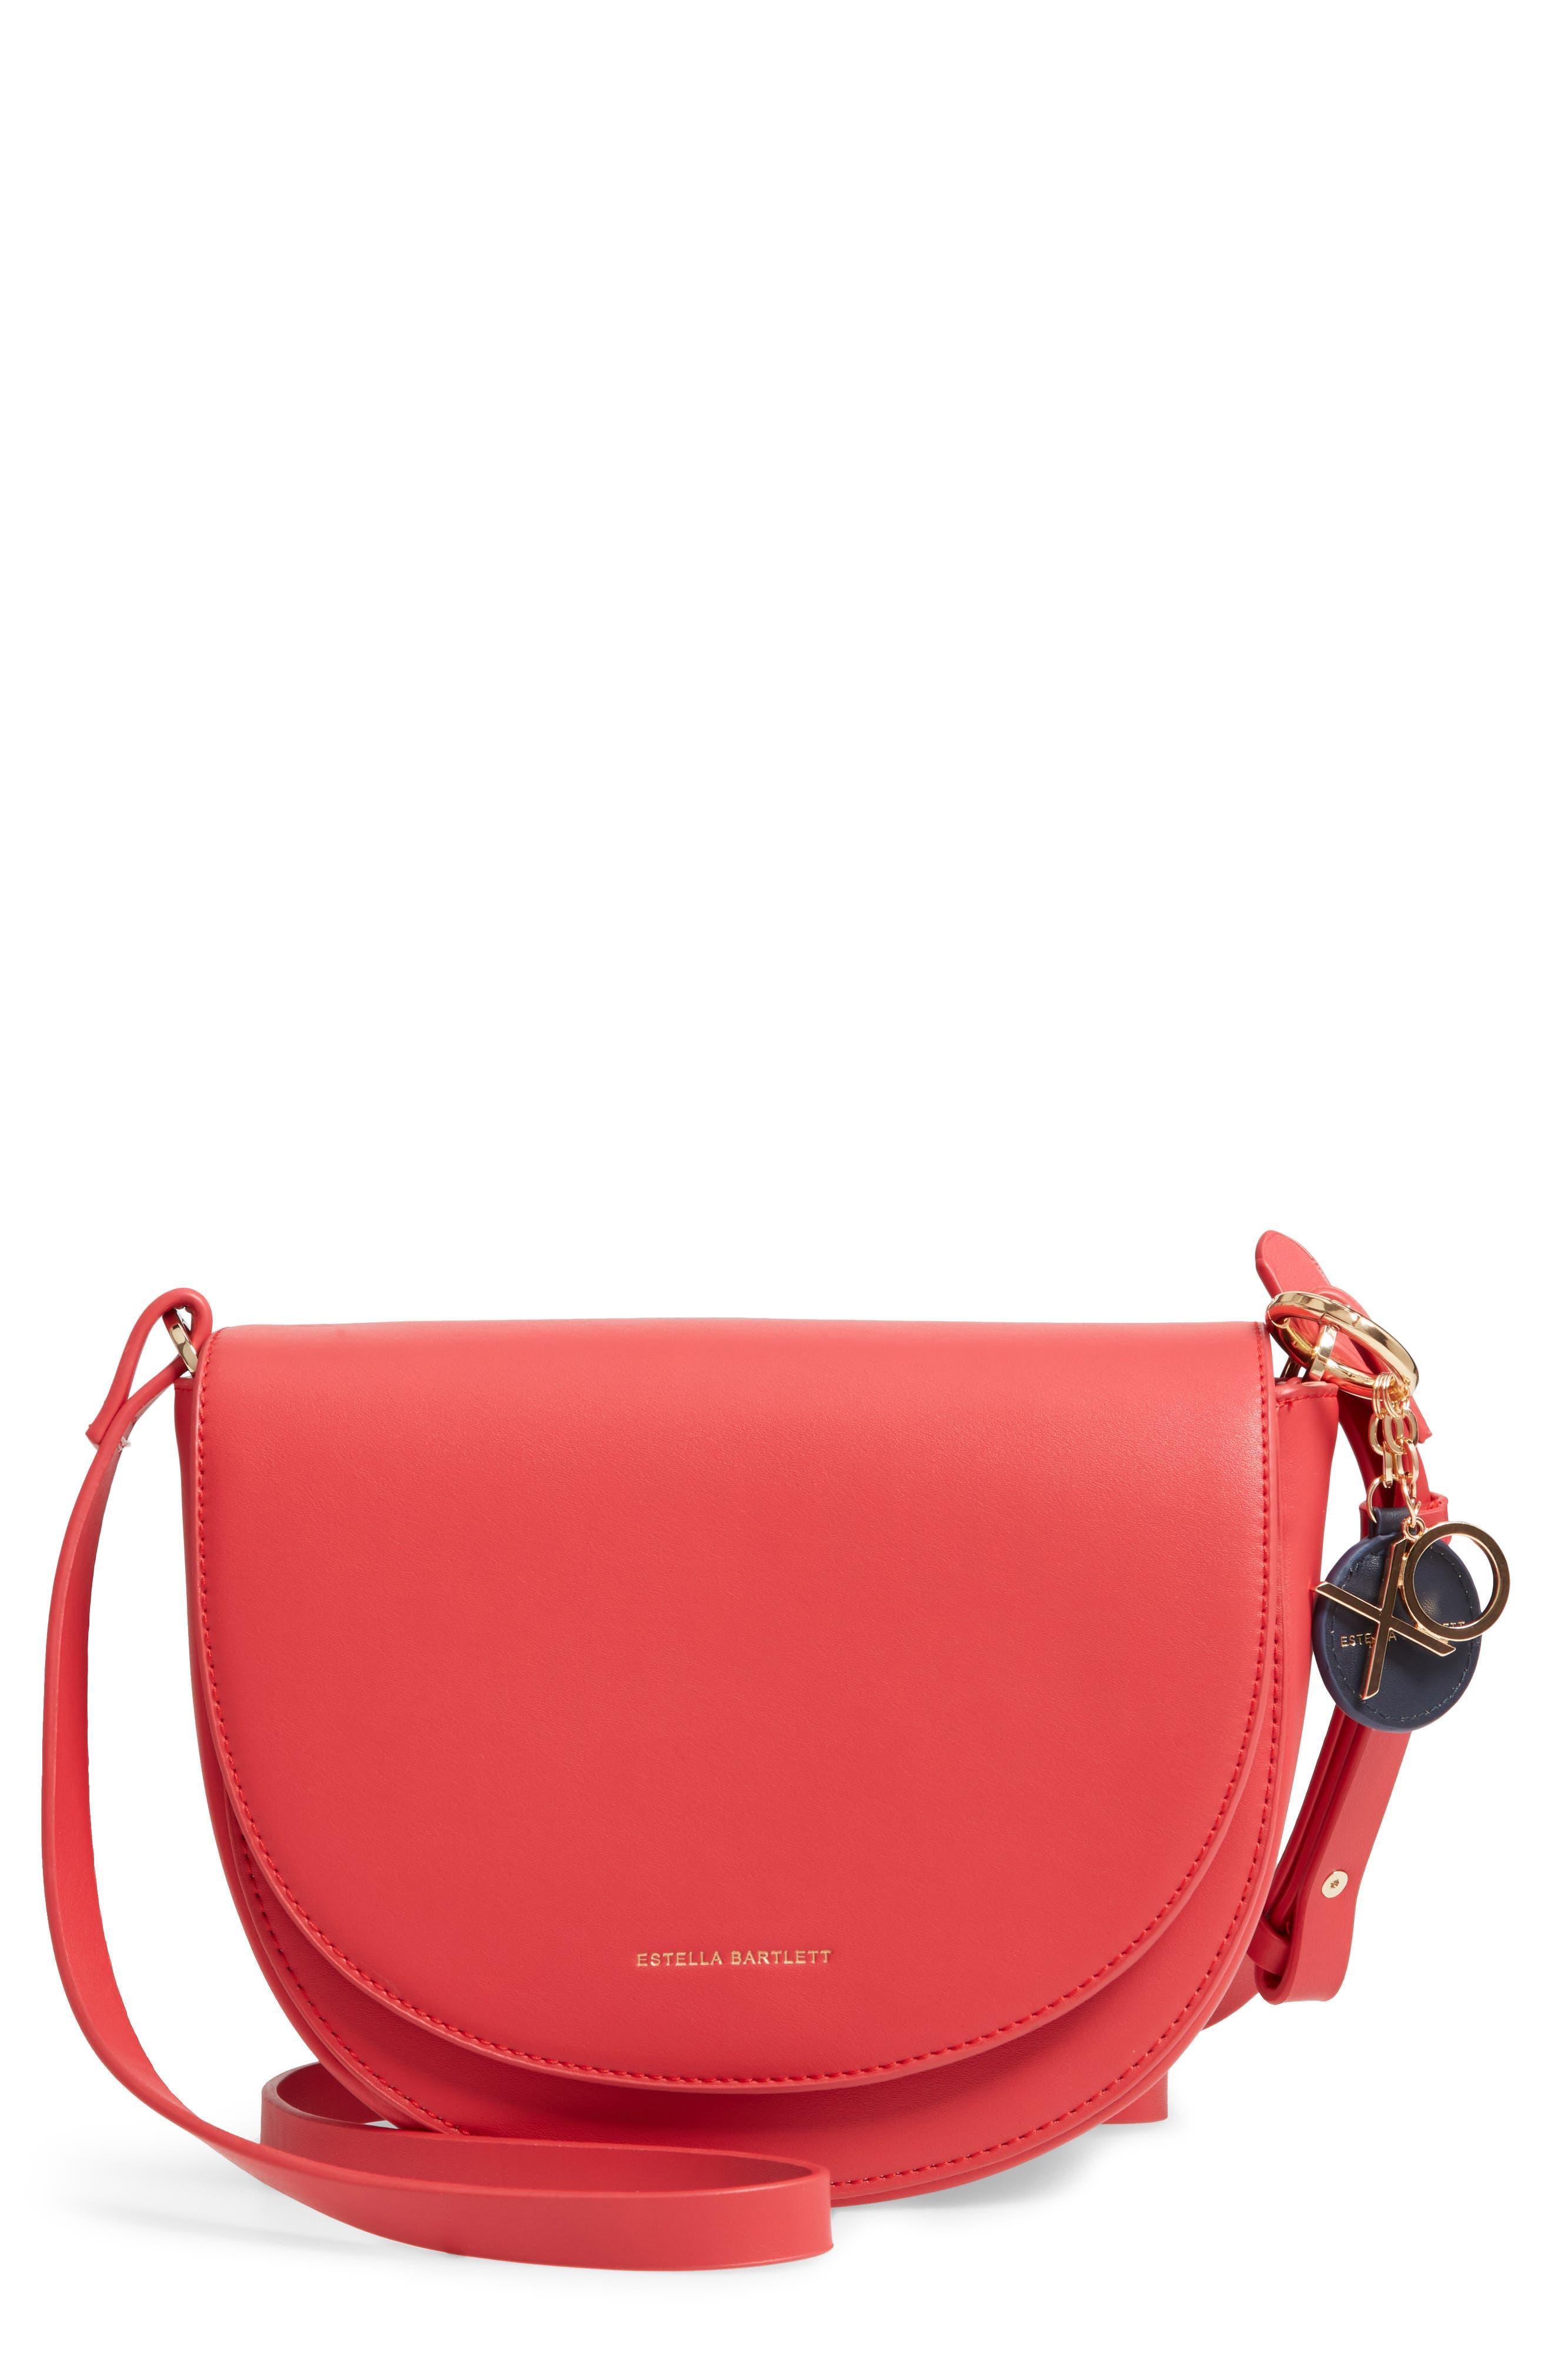 ESTELLA BARTLETT, Loman Faux Leather Saddle Bag, Main thumbnail 1, color, 600